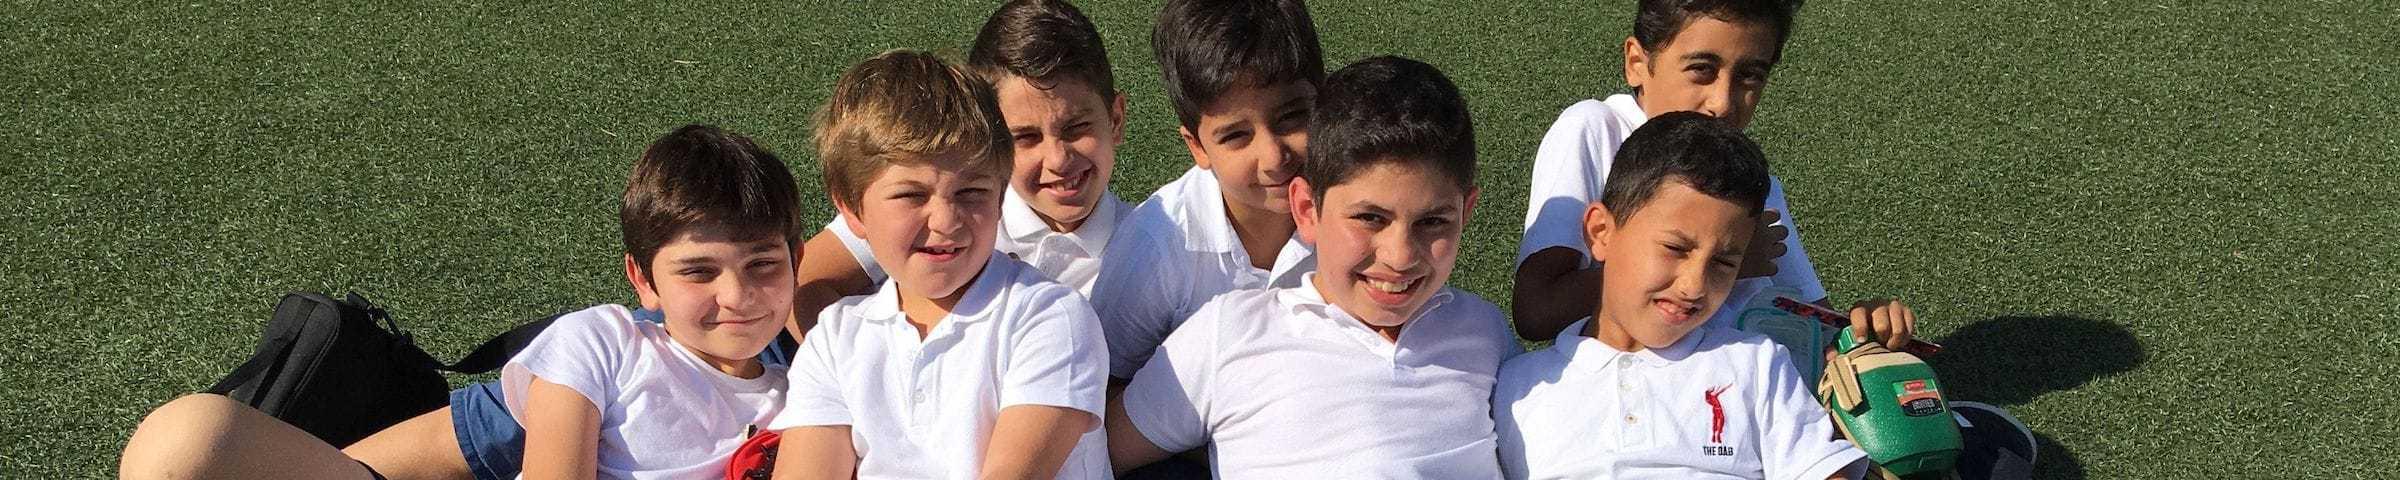 boys on football pitch